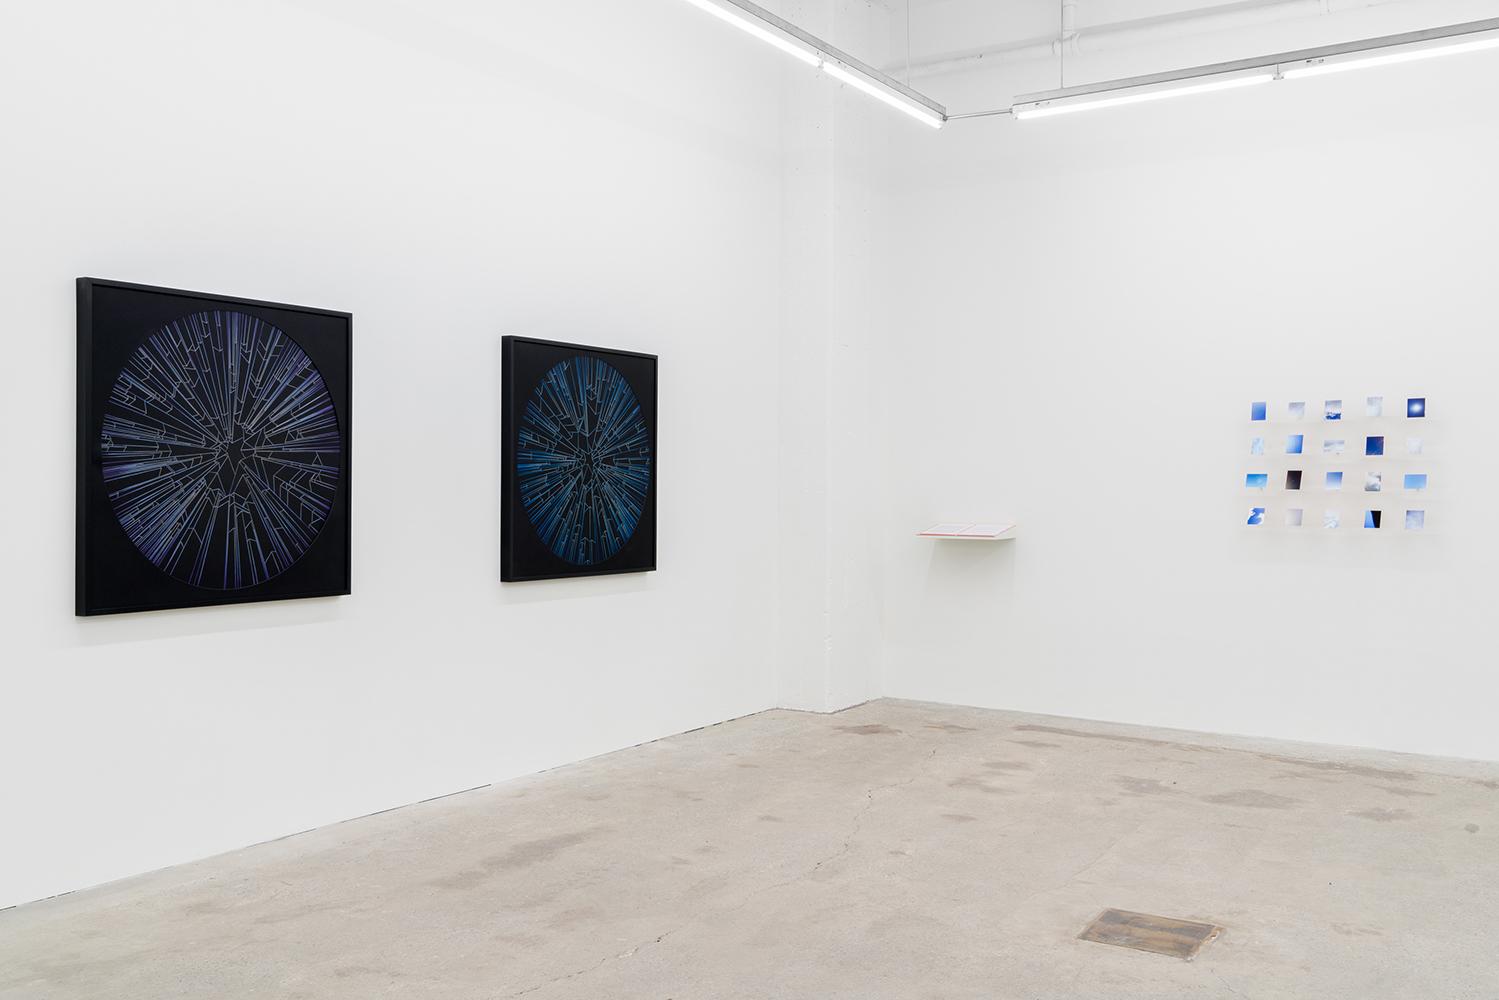 GalerieNicolasRobertSummer2019 (9 of 21).jpg